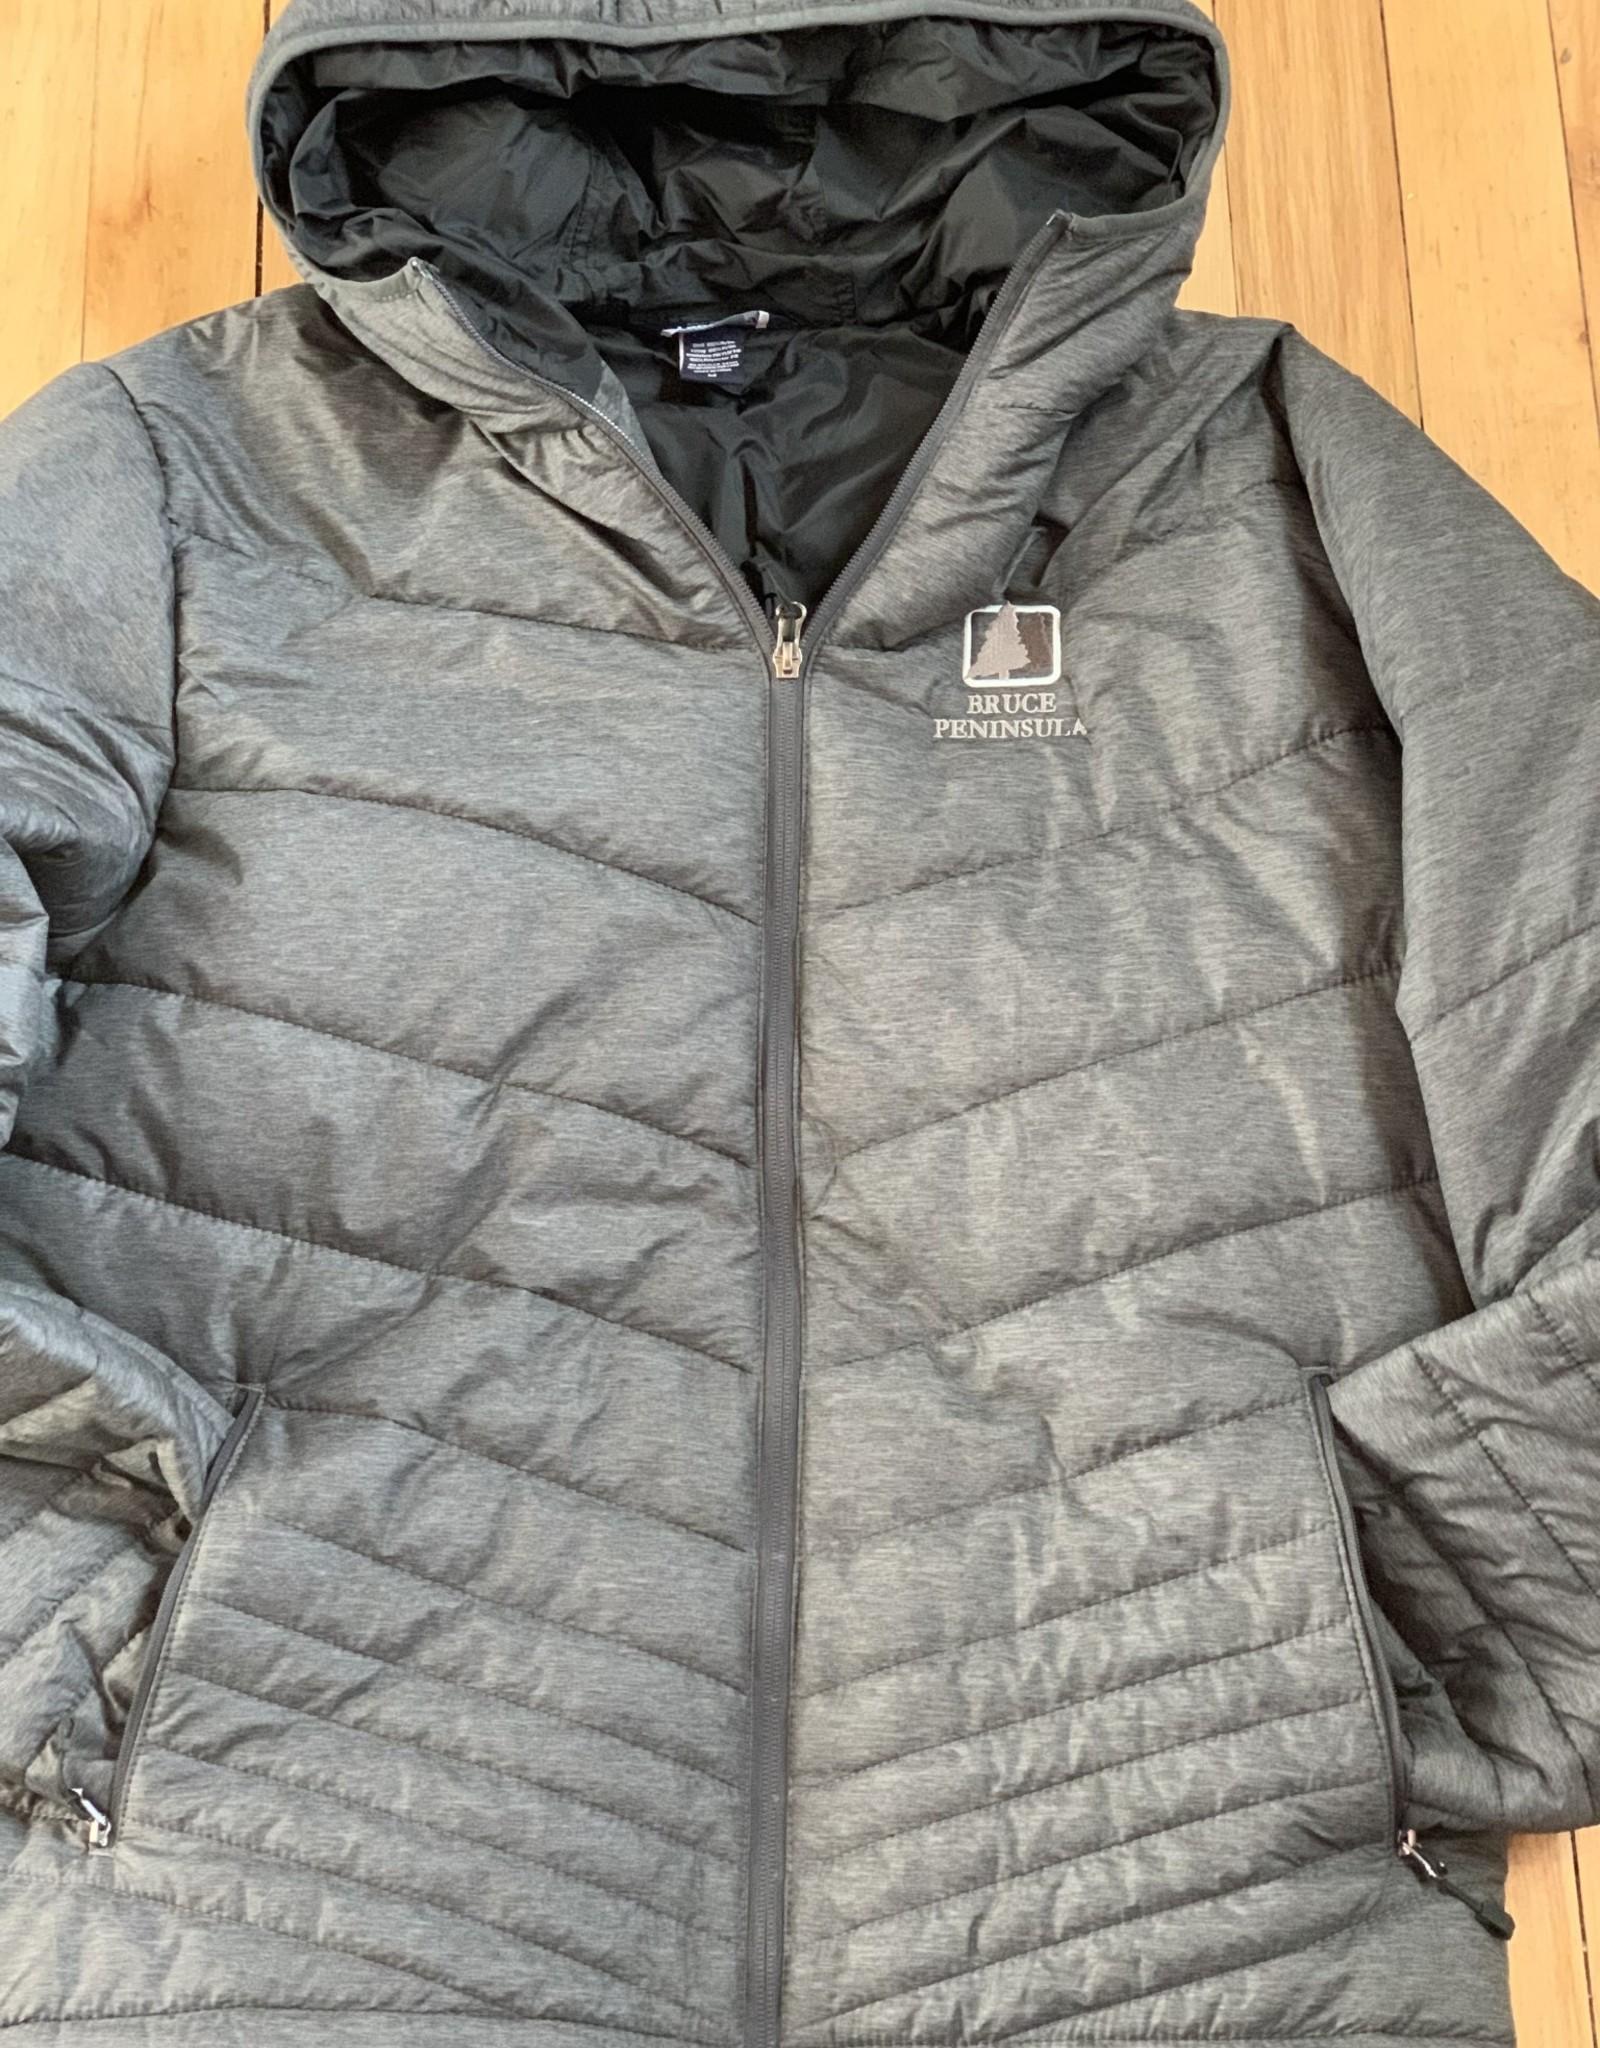 Landway Bruce Peninsula Grey Puff Jacket Men's Fit